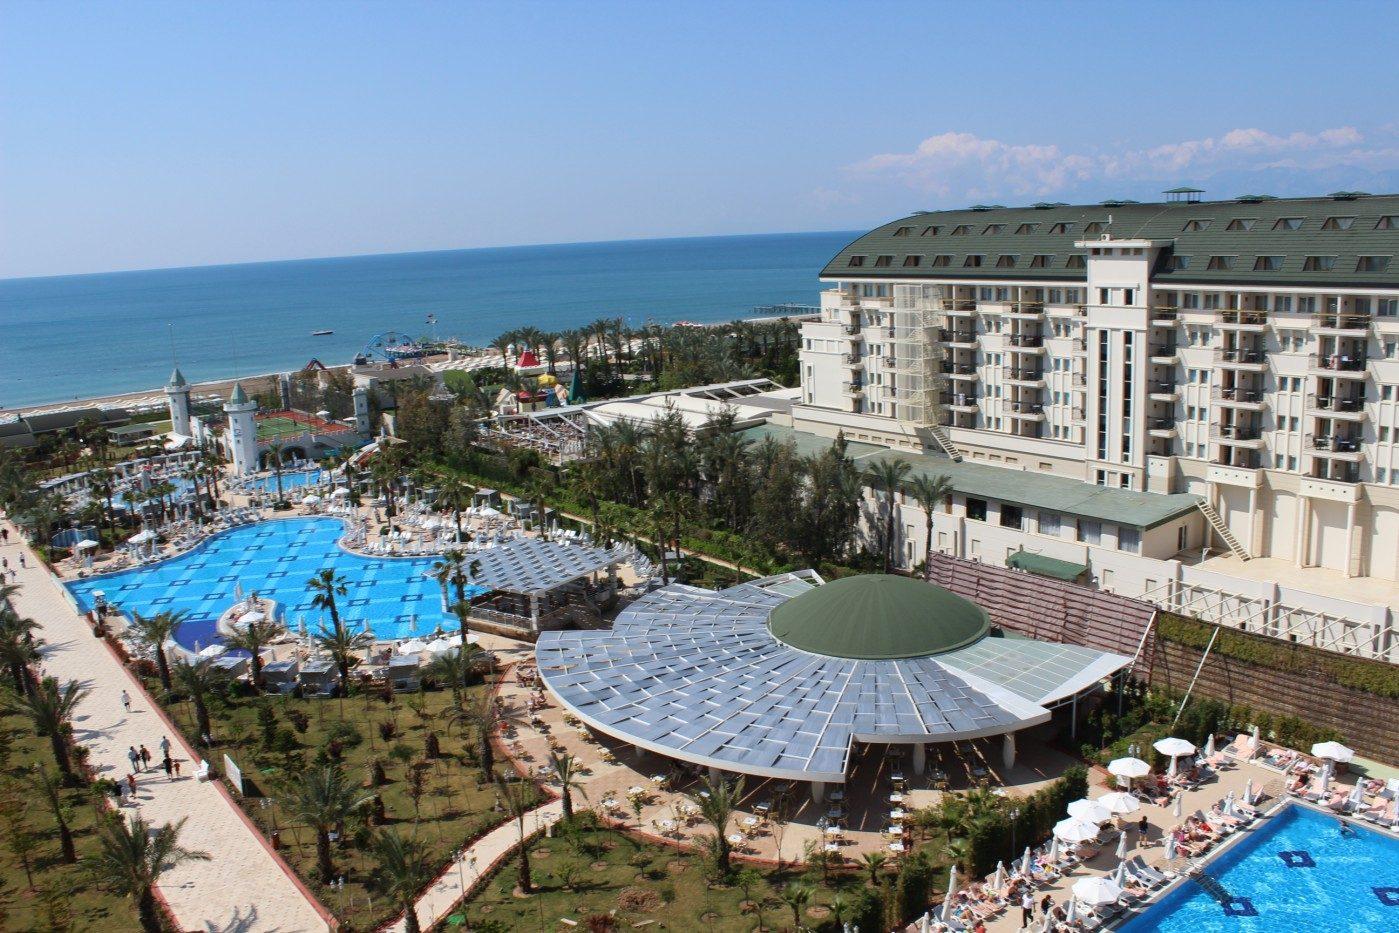 территория отеля Delphin Imperial Lara